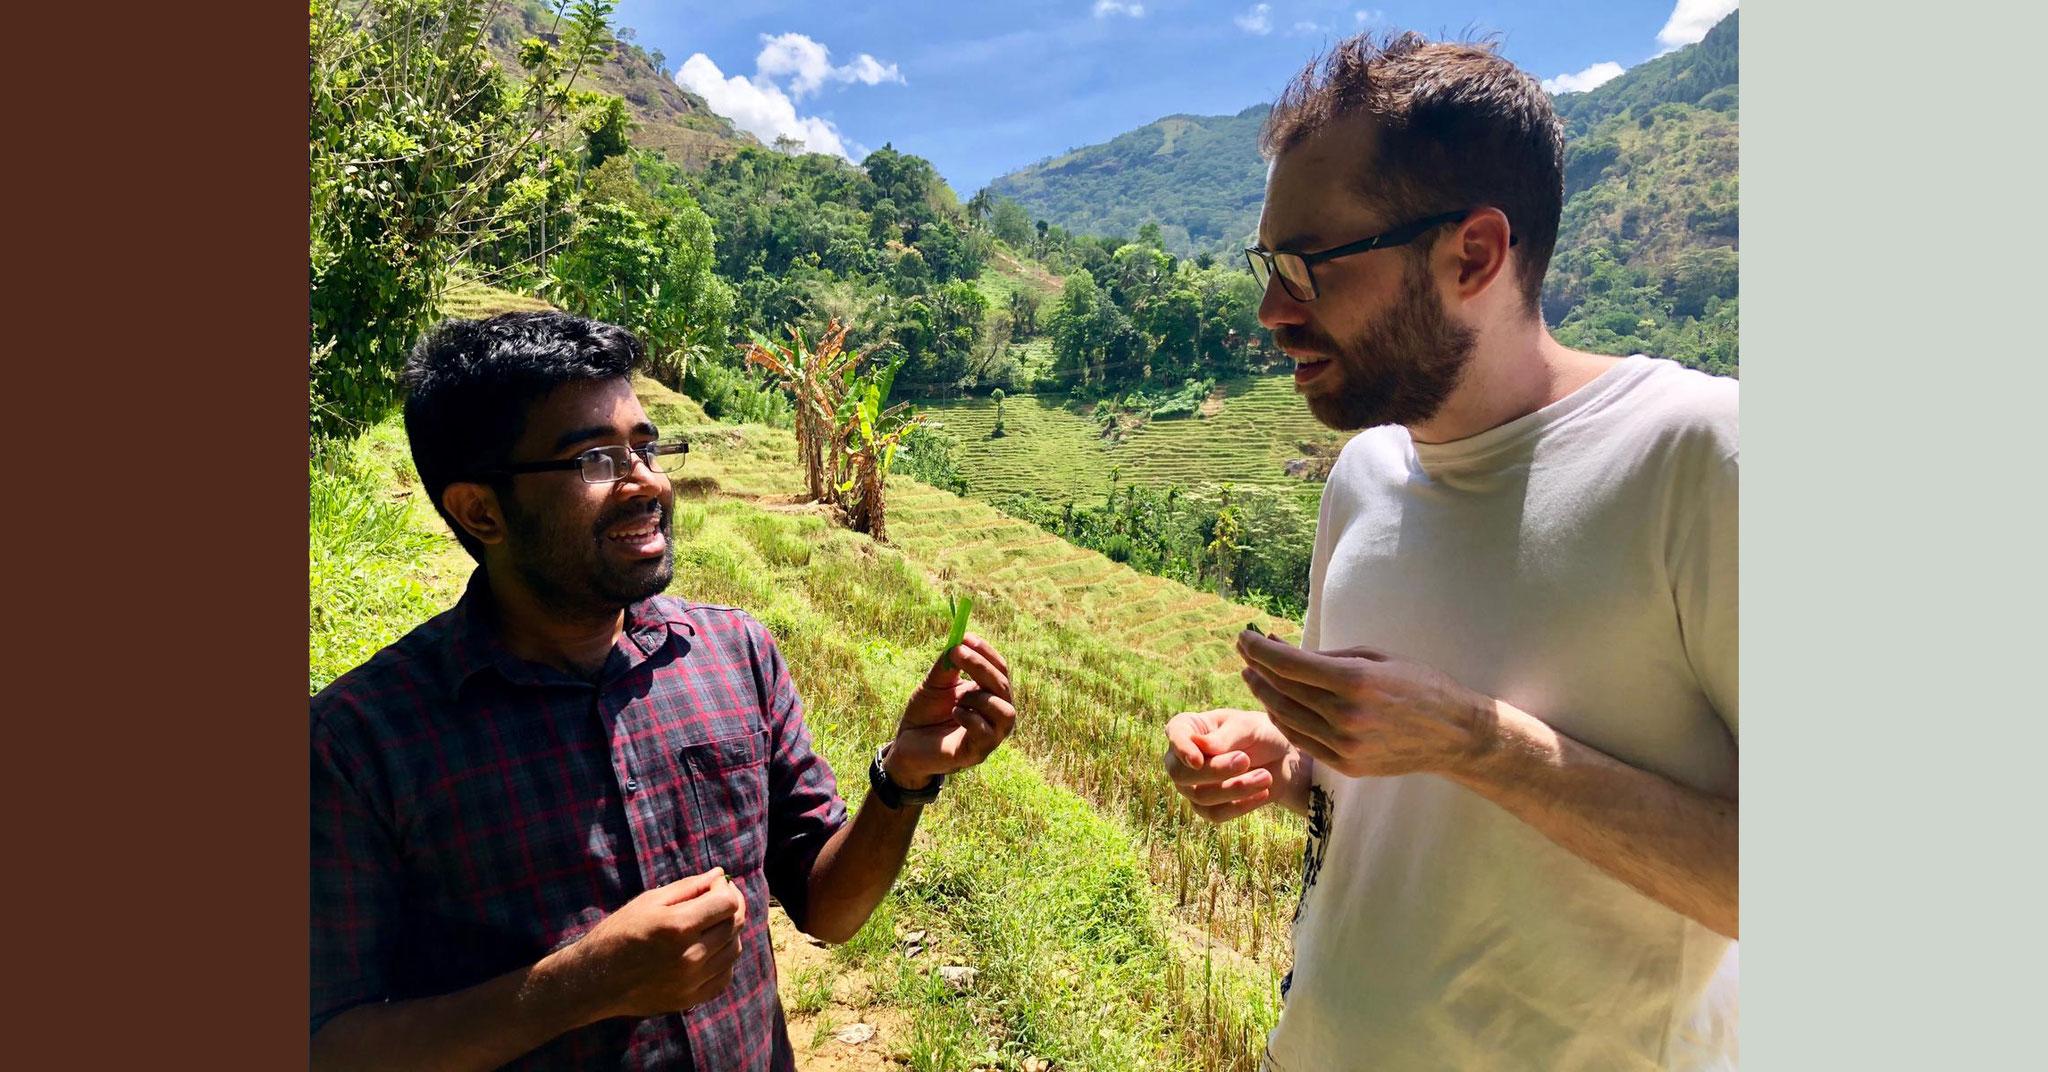 Reiseblog mit Rezepten aus Sri Lanka